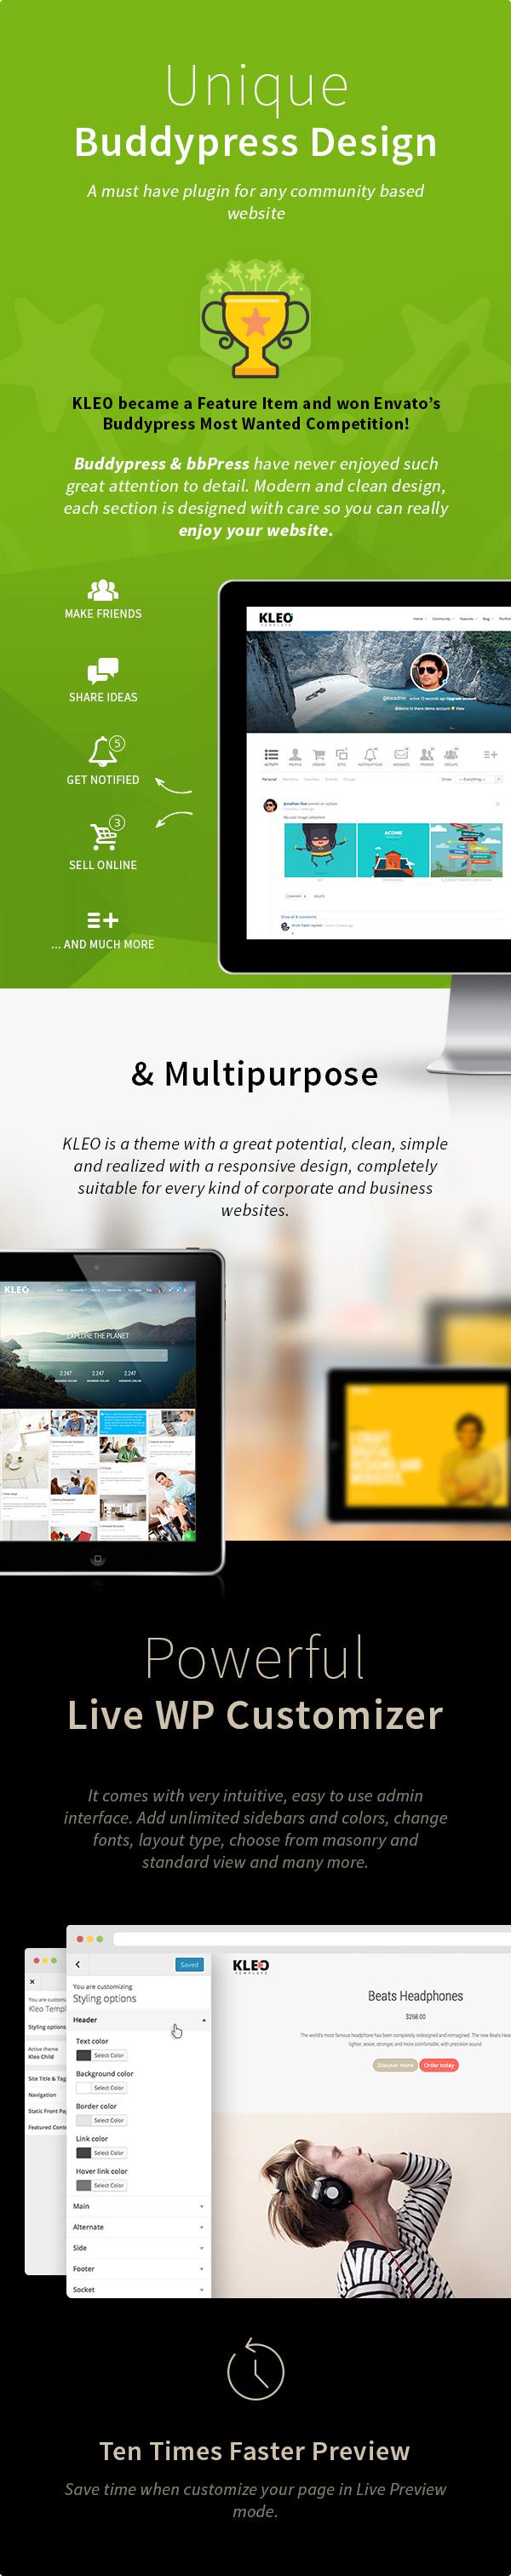 KLEO - Pro Community Focused, Multi-Purpose BuddyPress Theme - 8